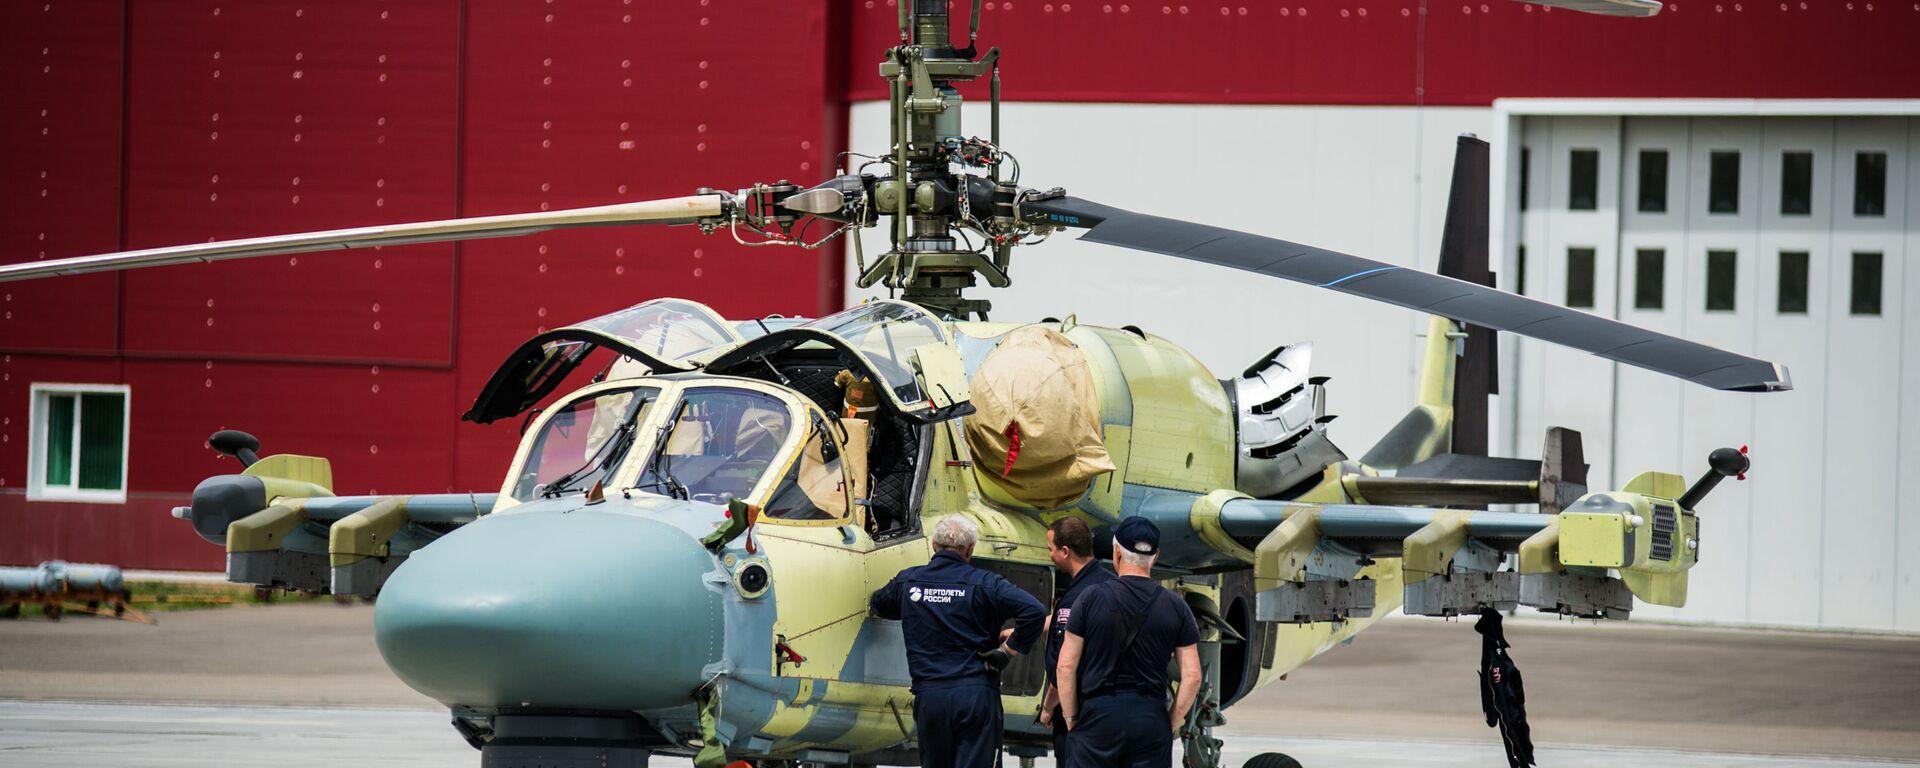 Un elicottero Ka-52 sulla pista dell'aerodromo di Arsenyev - Sputnik Italia, 1920, 18.07.2019